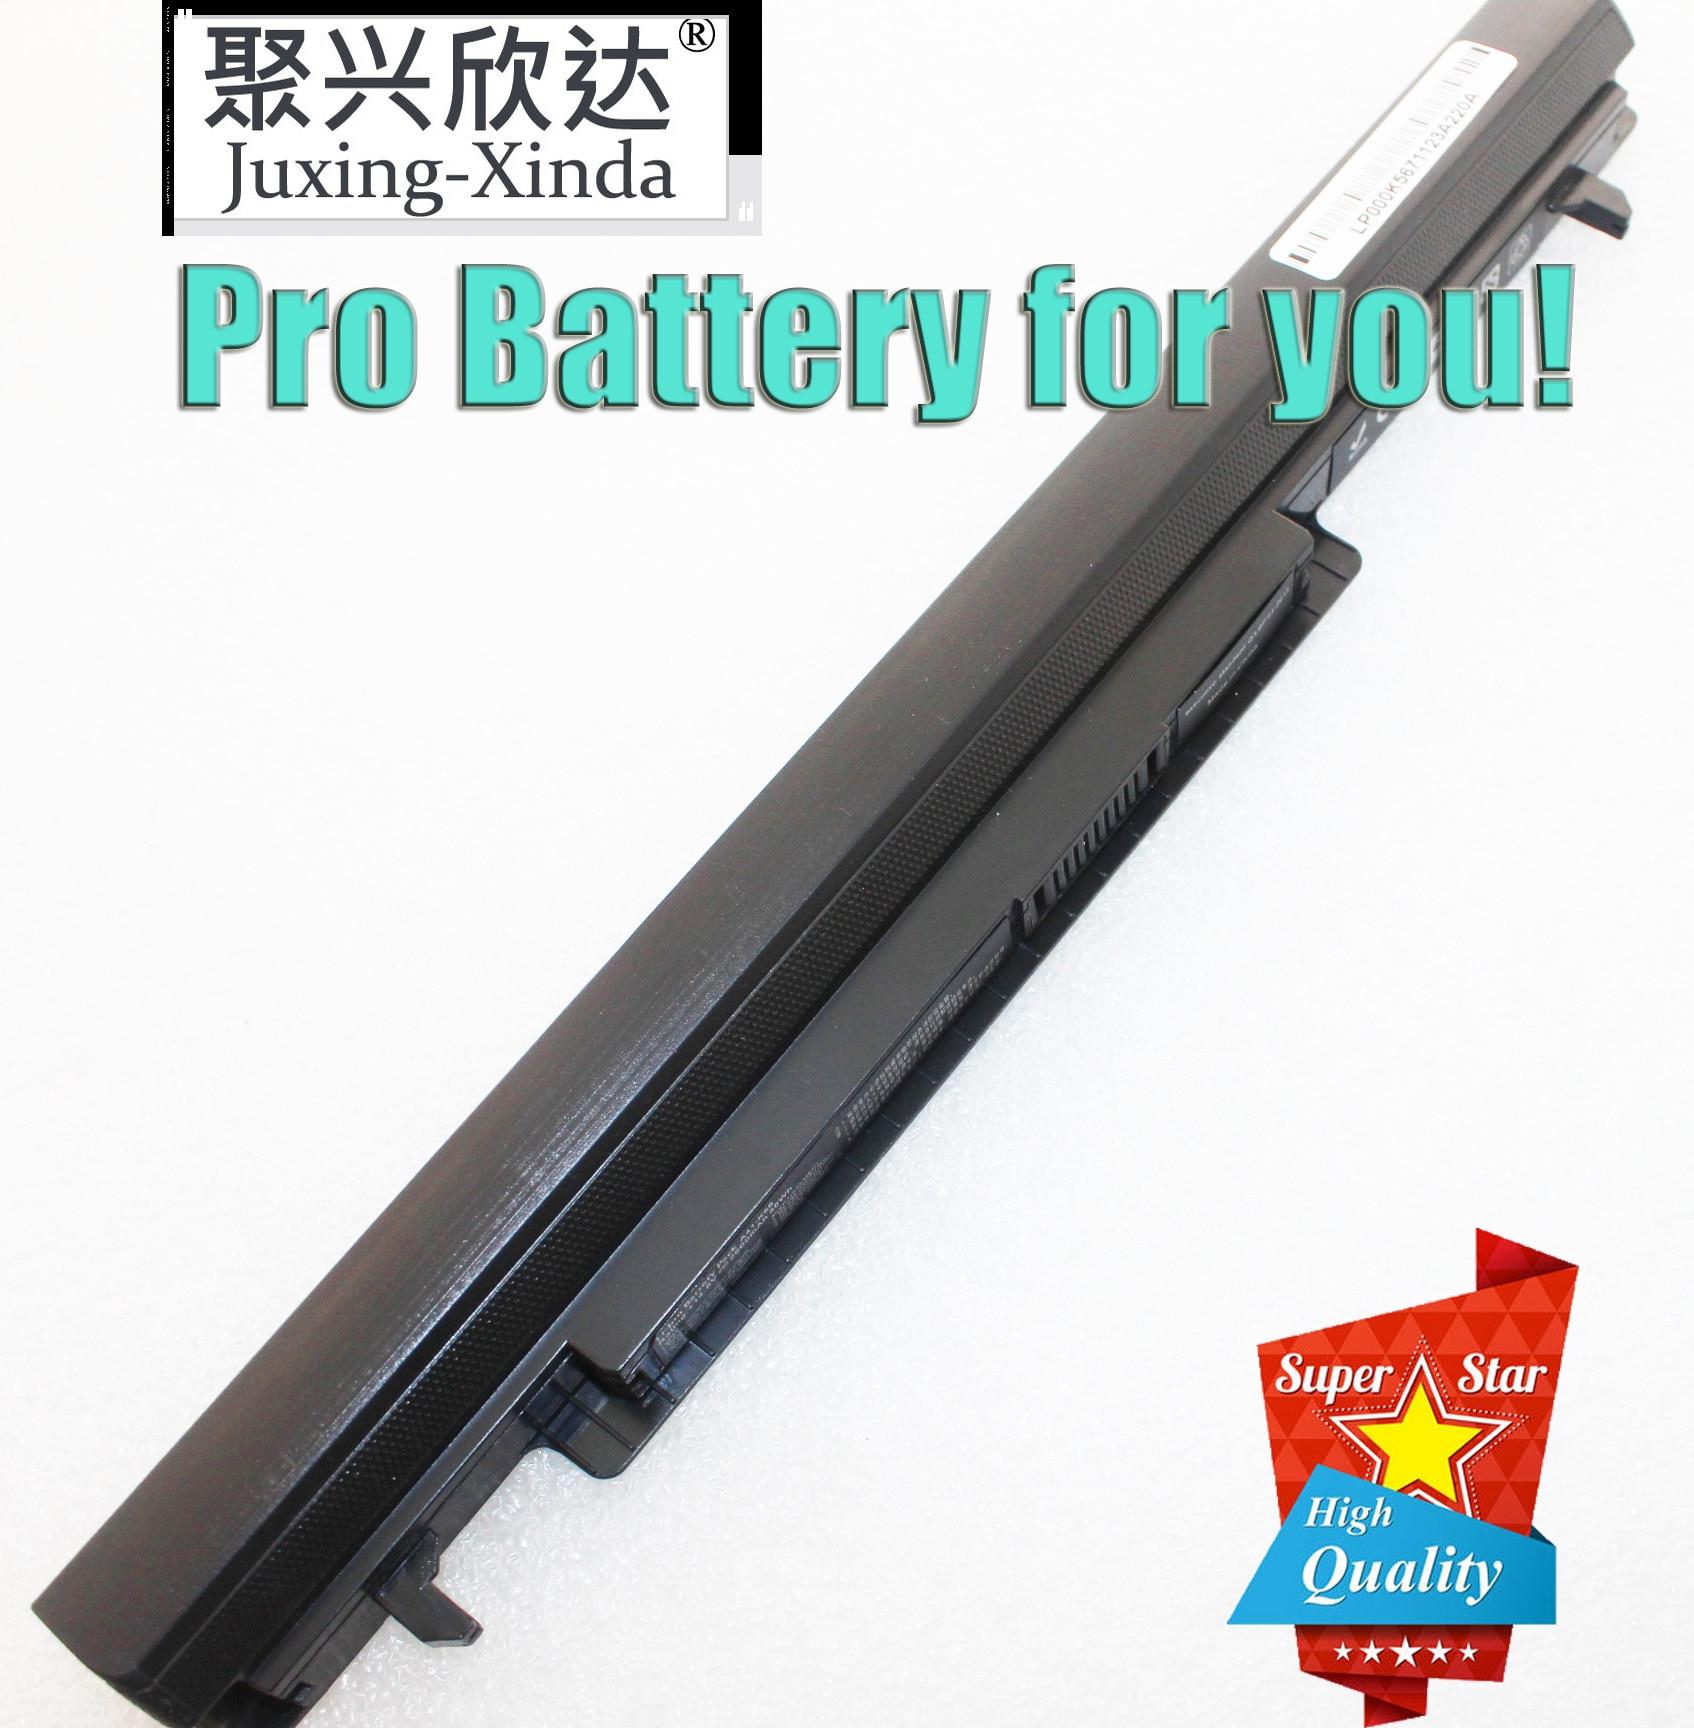 Laptop Battery For Asus A31-K56 A32-K56 A41-K56 A42-K56 Series A56 A46 K56 K56C K56CA K56CM K46 K46C K46CA K46CM S56 S46 R505